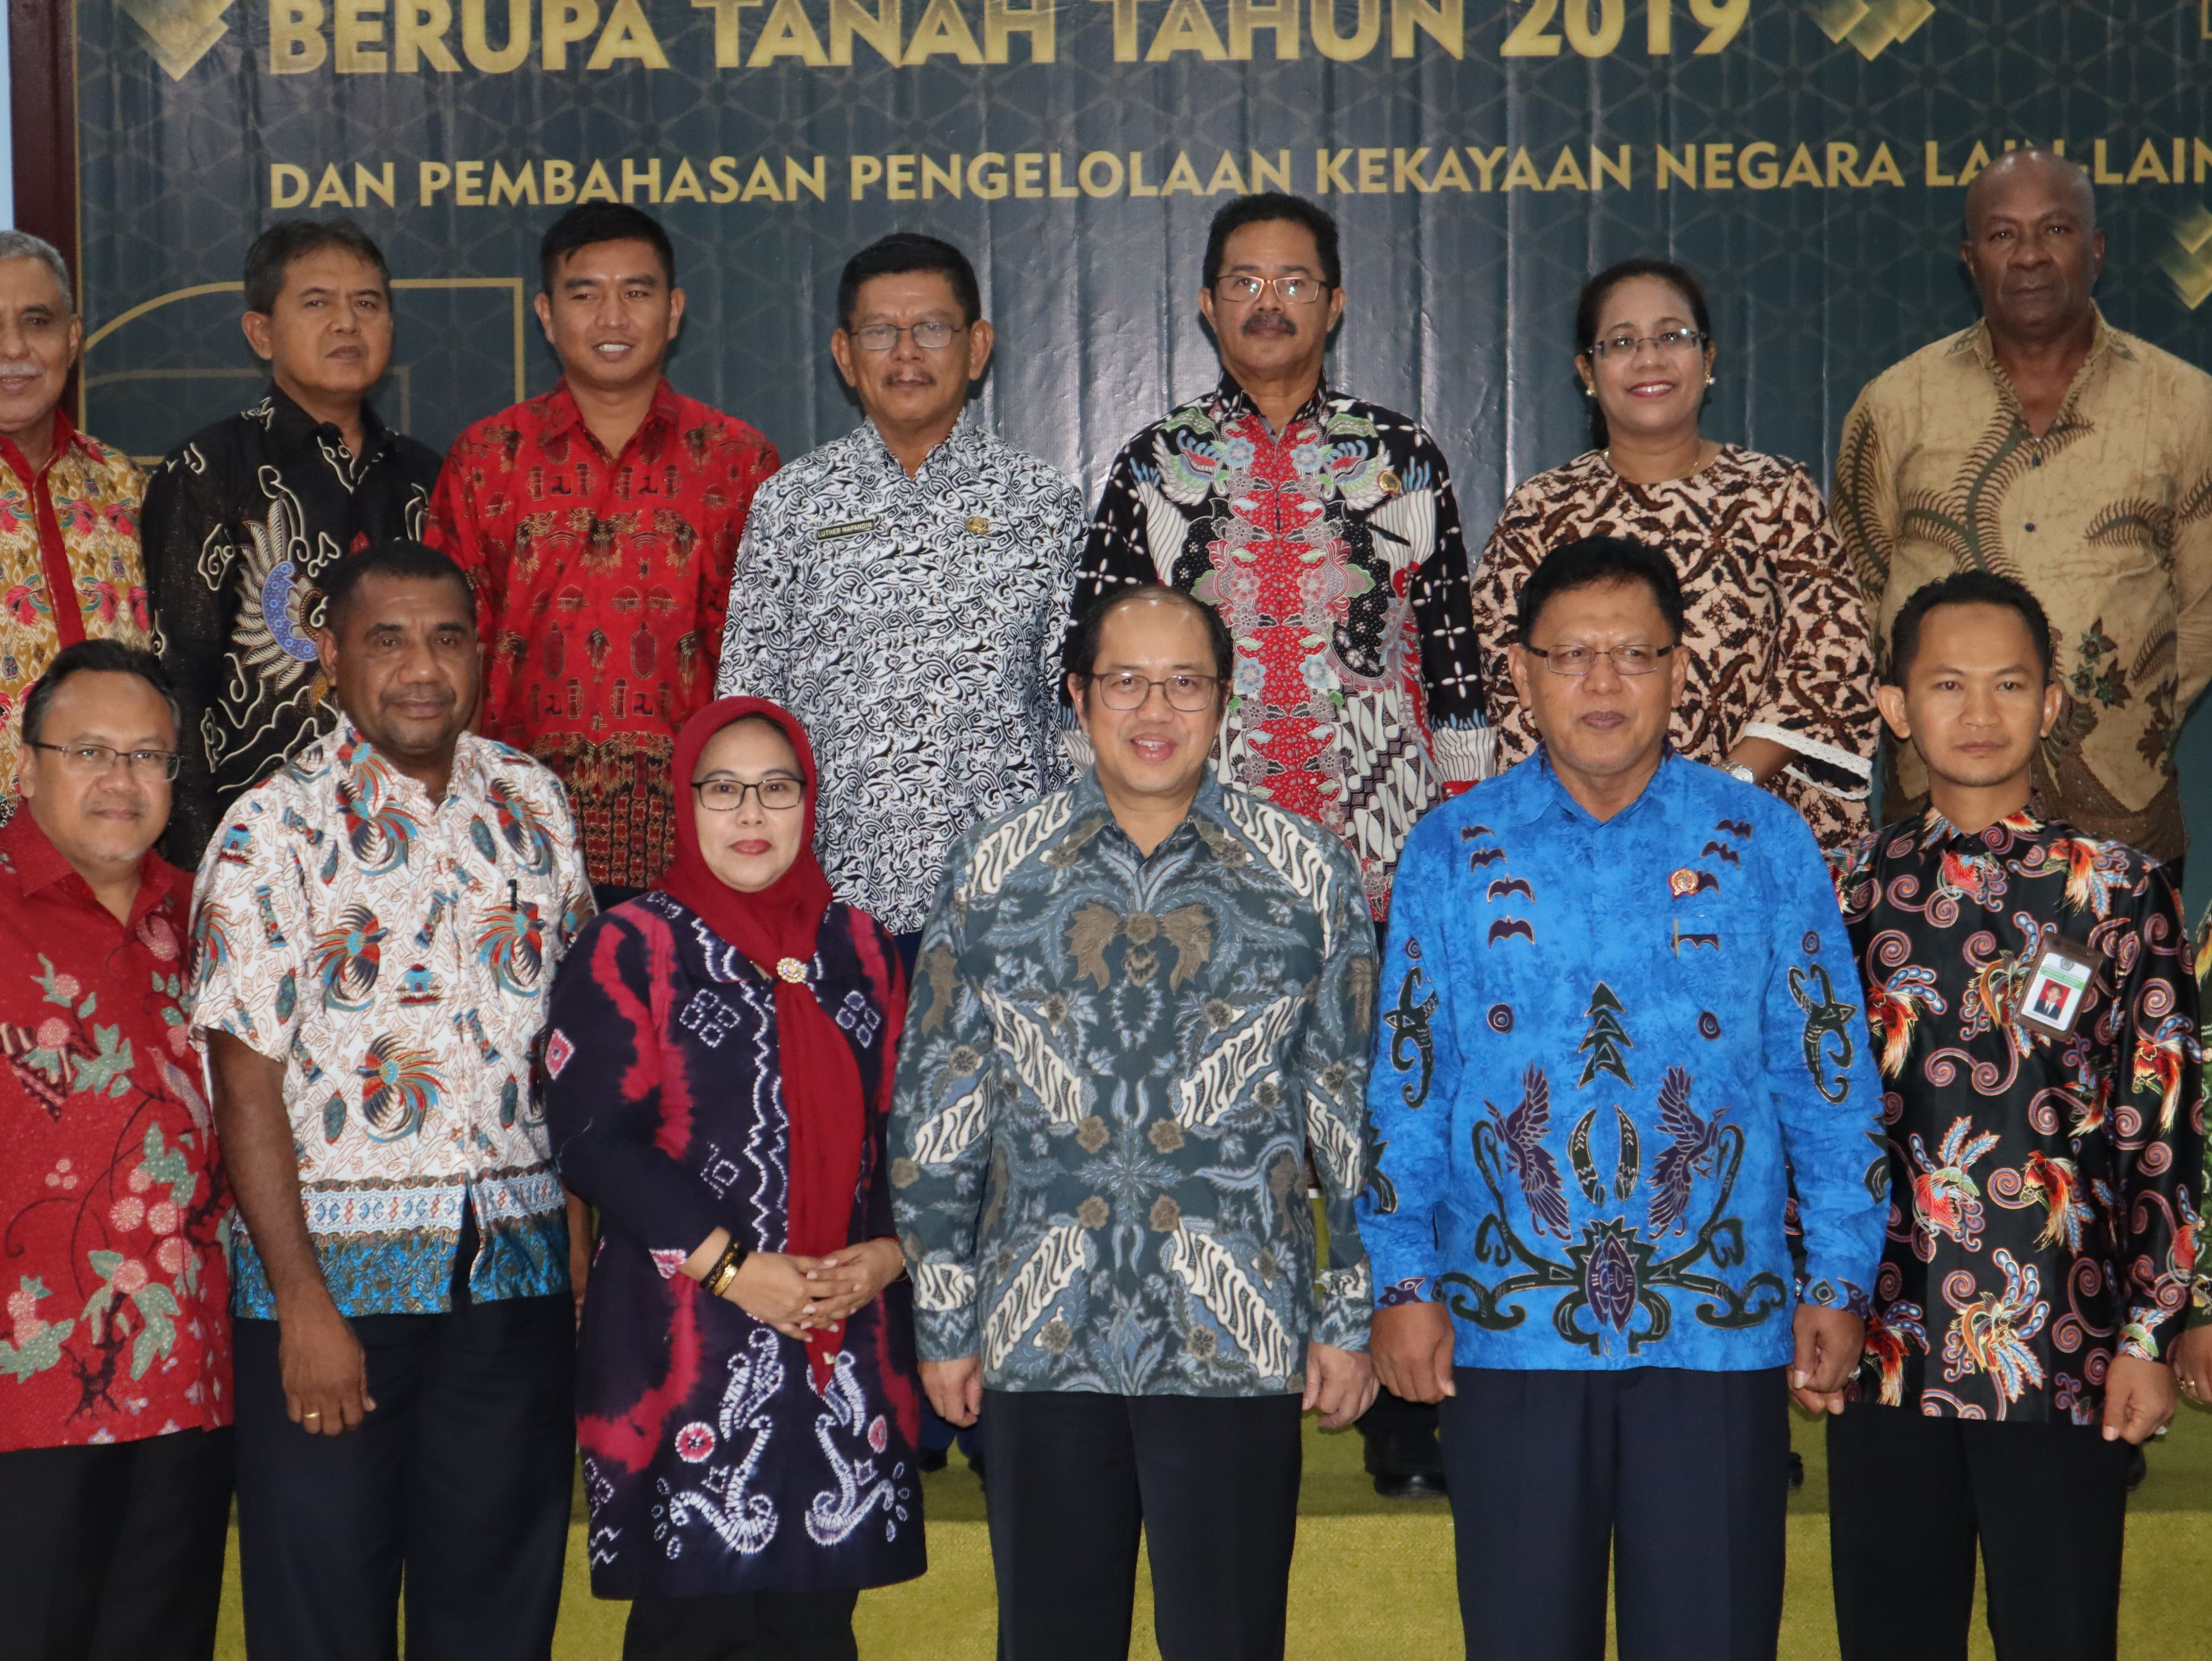 Dirjen Kekayaan Negara Apresiasi Sertipikasi BMN Berupa Tanah Tahun 2019 Wilayah Papabaruku